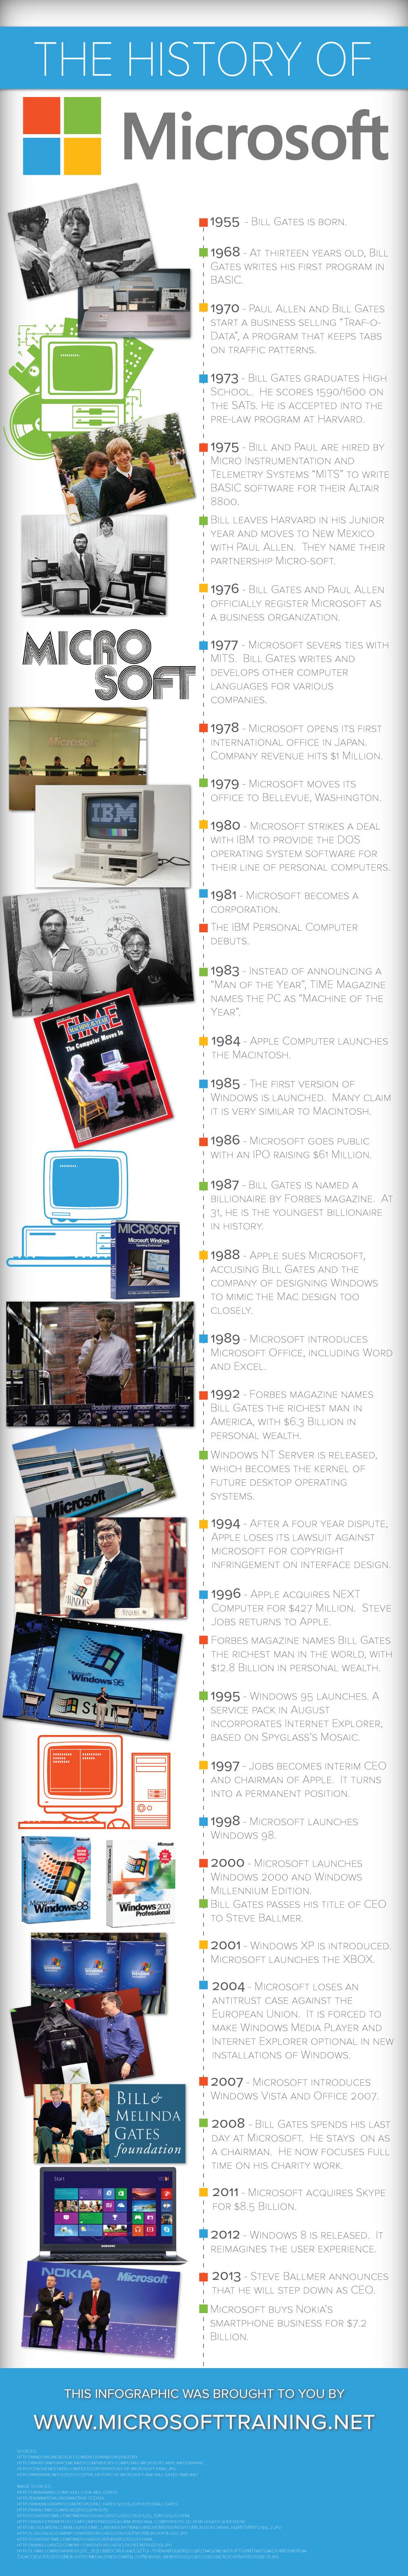 the-history-of-microsoft_52569dd1ed391